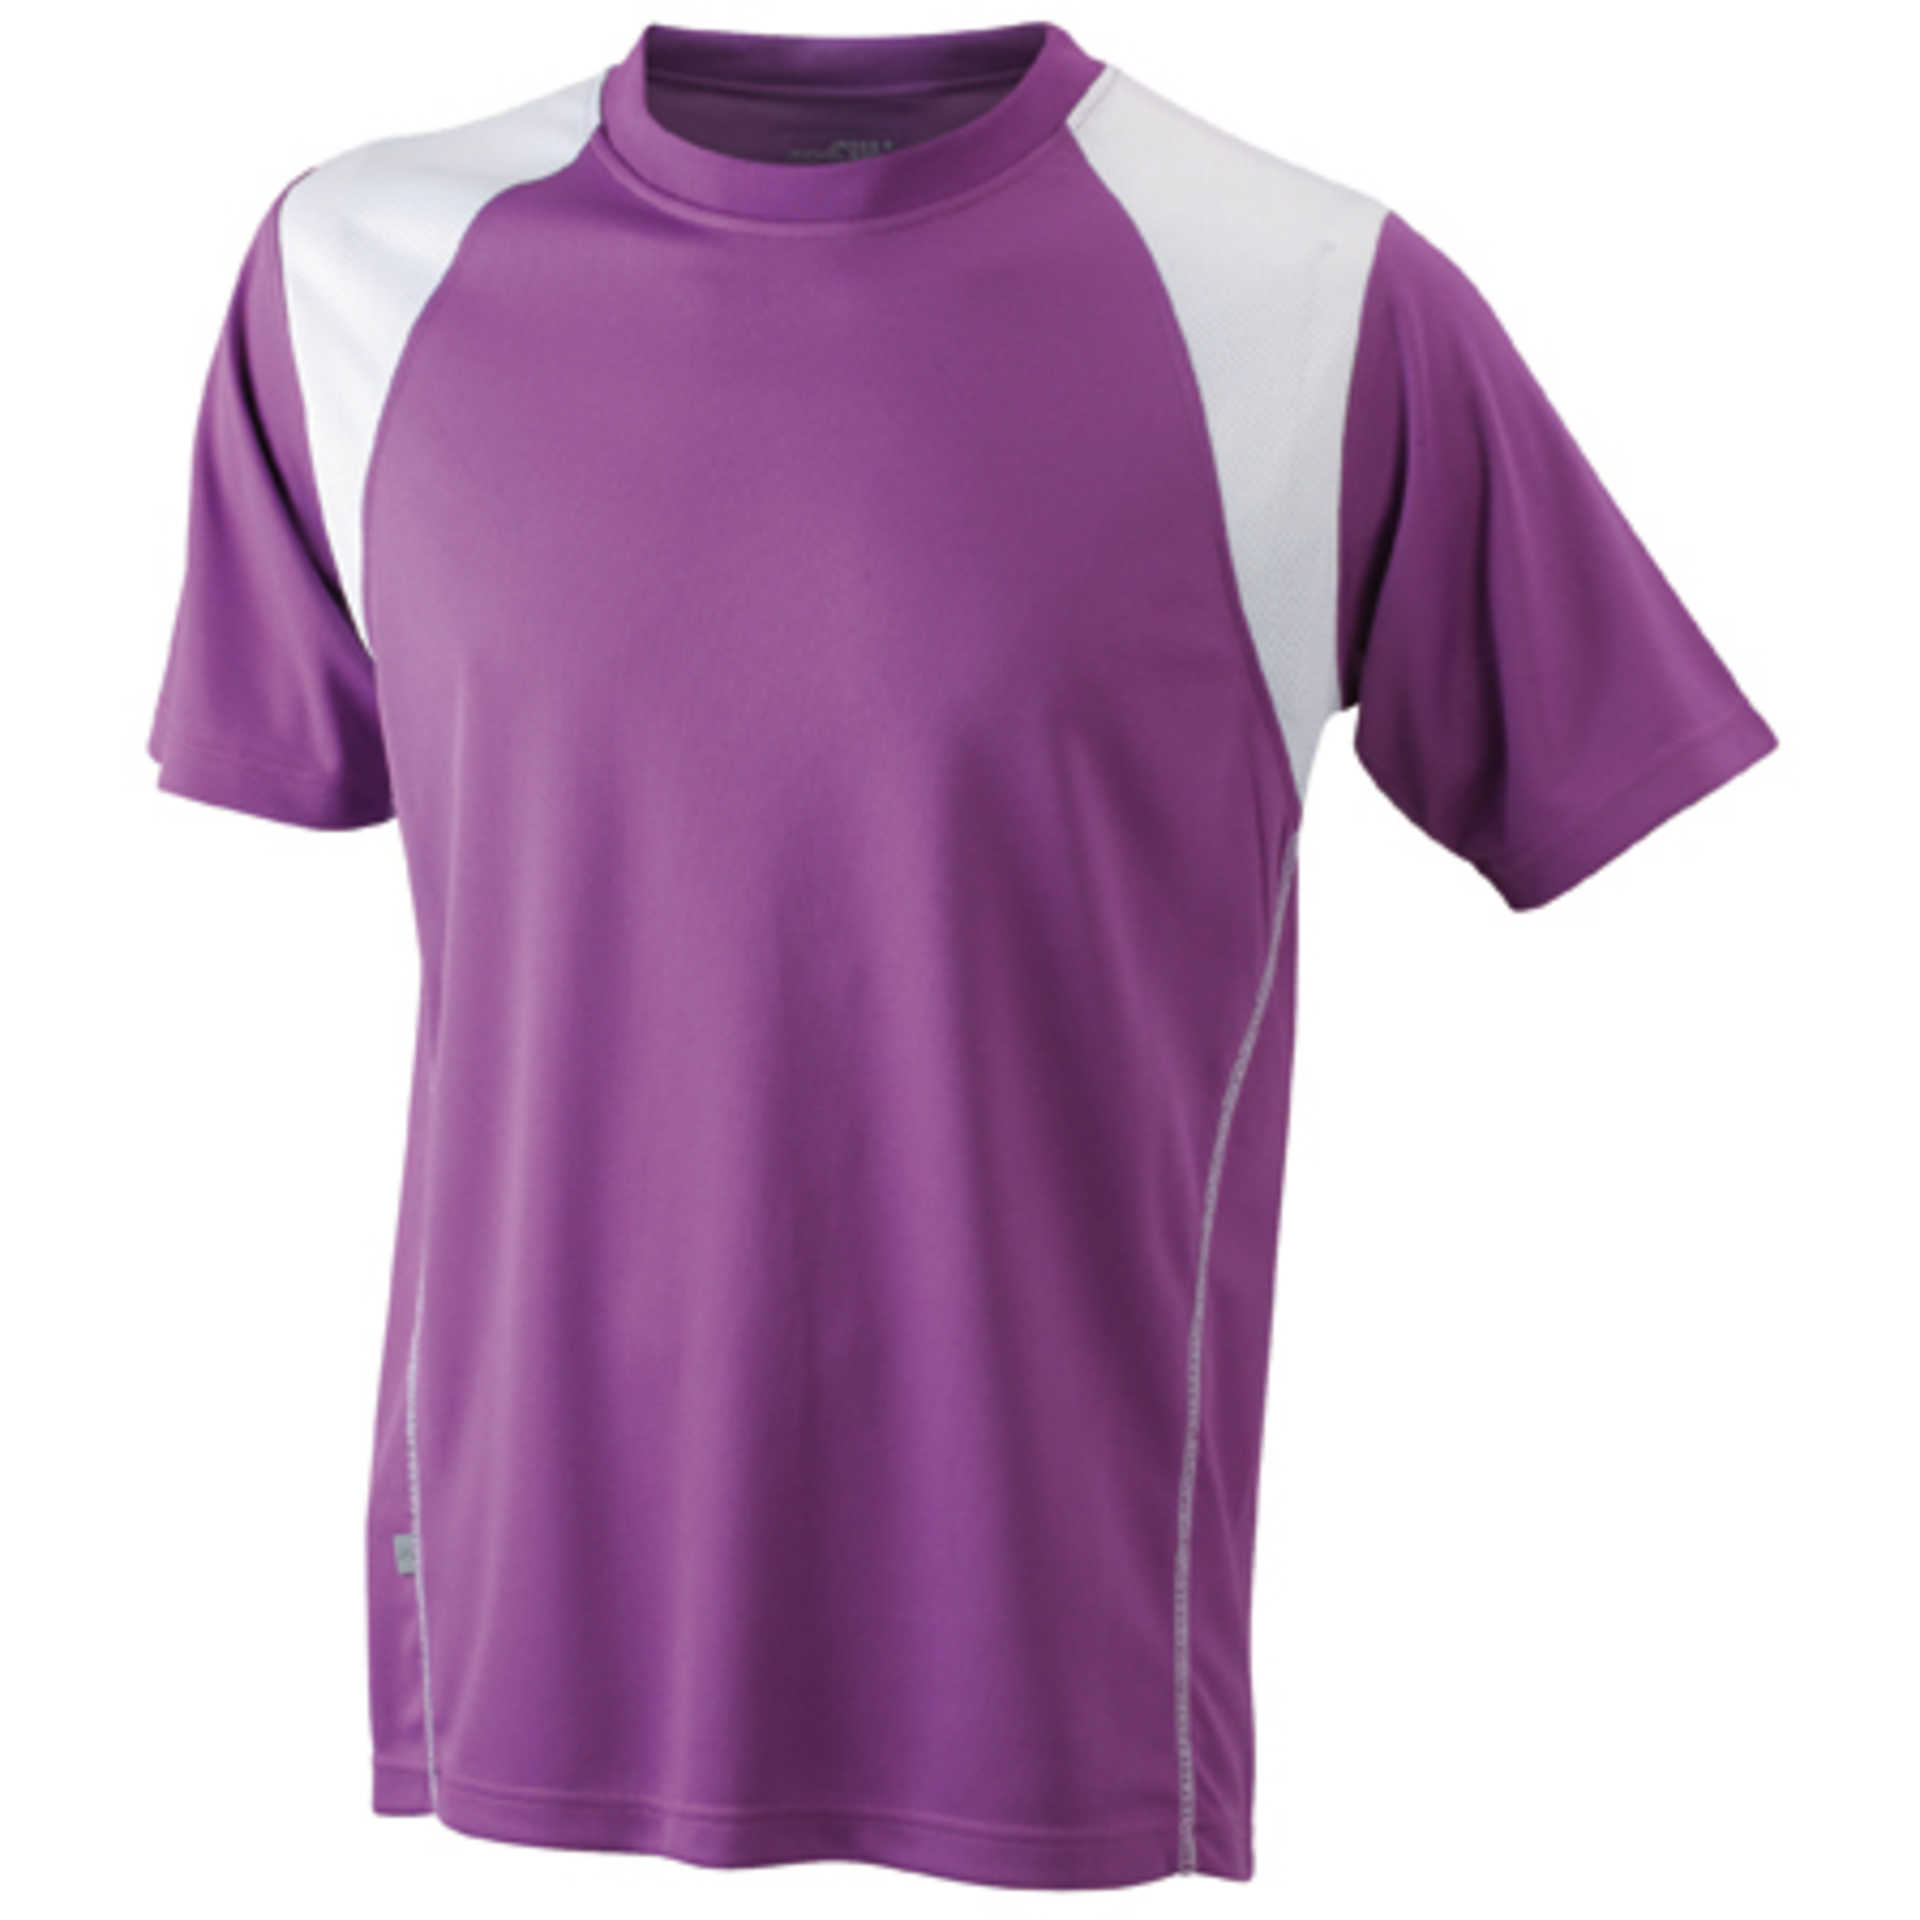 tee shirt personnalis men 39 s running t james nicholson purple white. Black Bedroom Furniture Sets. Home Design Ideas